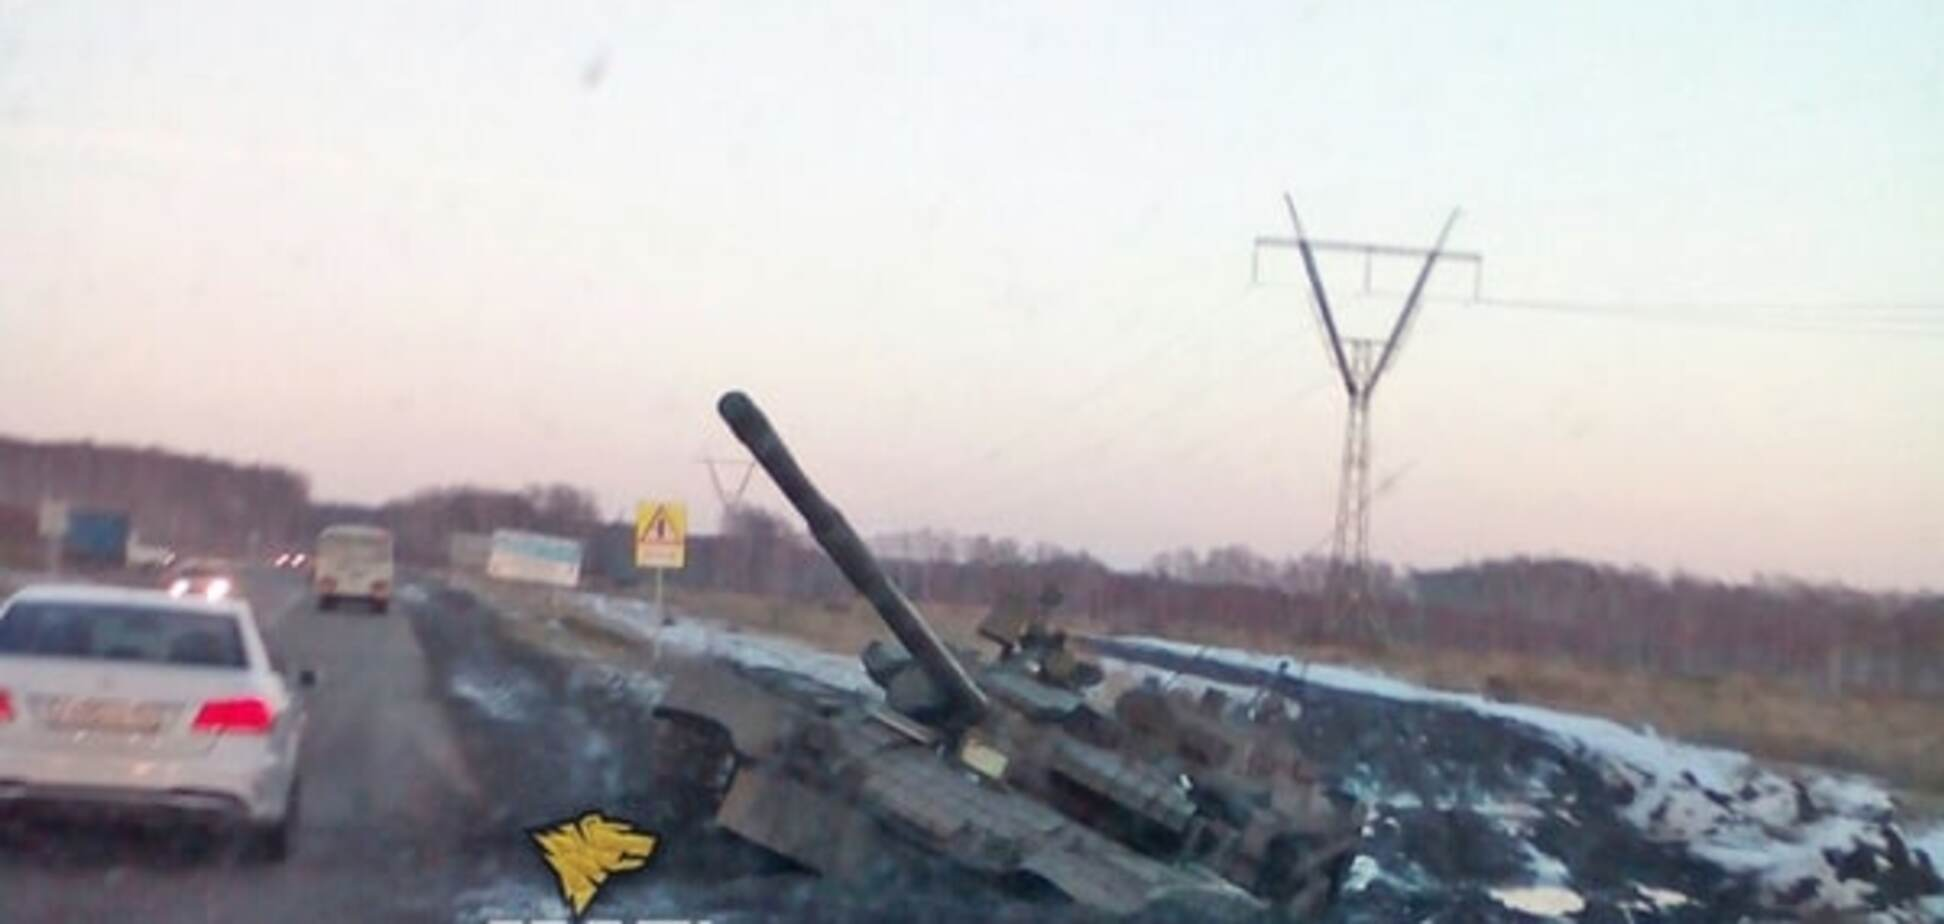 В России танк утонул в грязи на обочине дороги: фотофакт